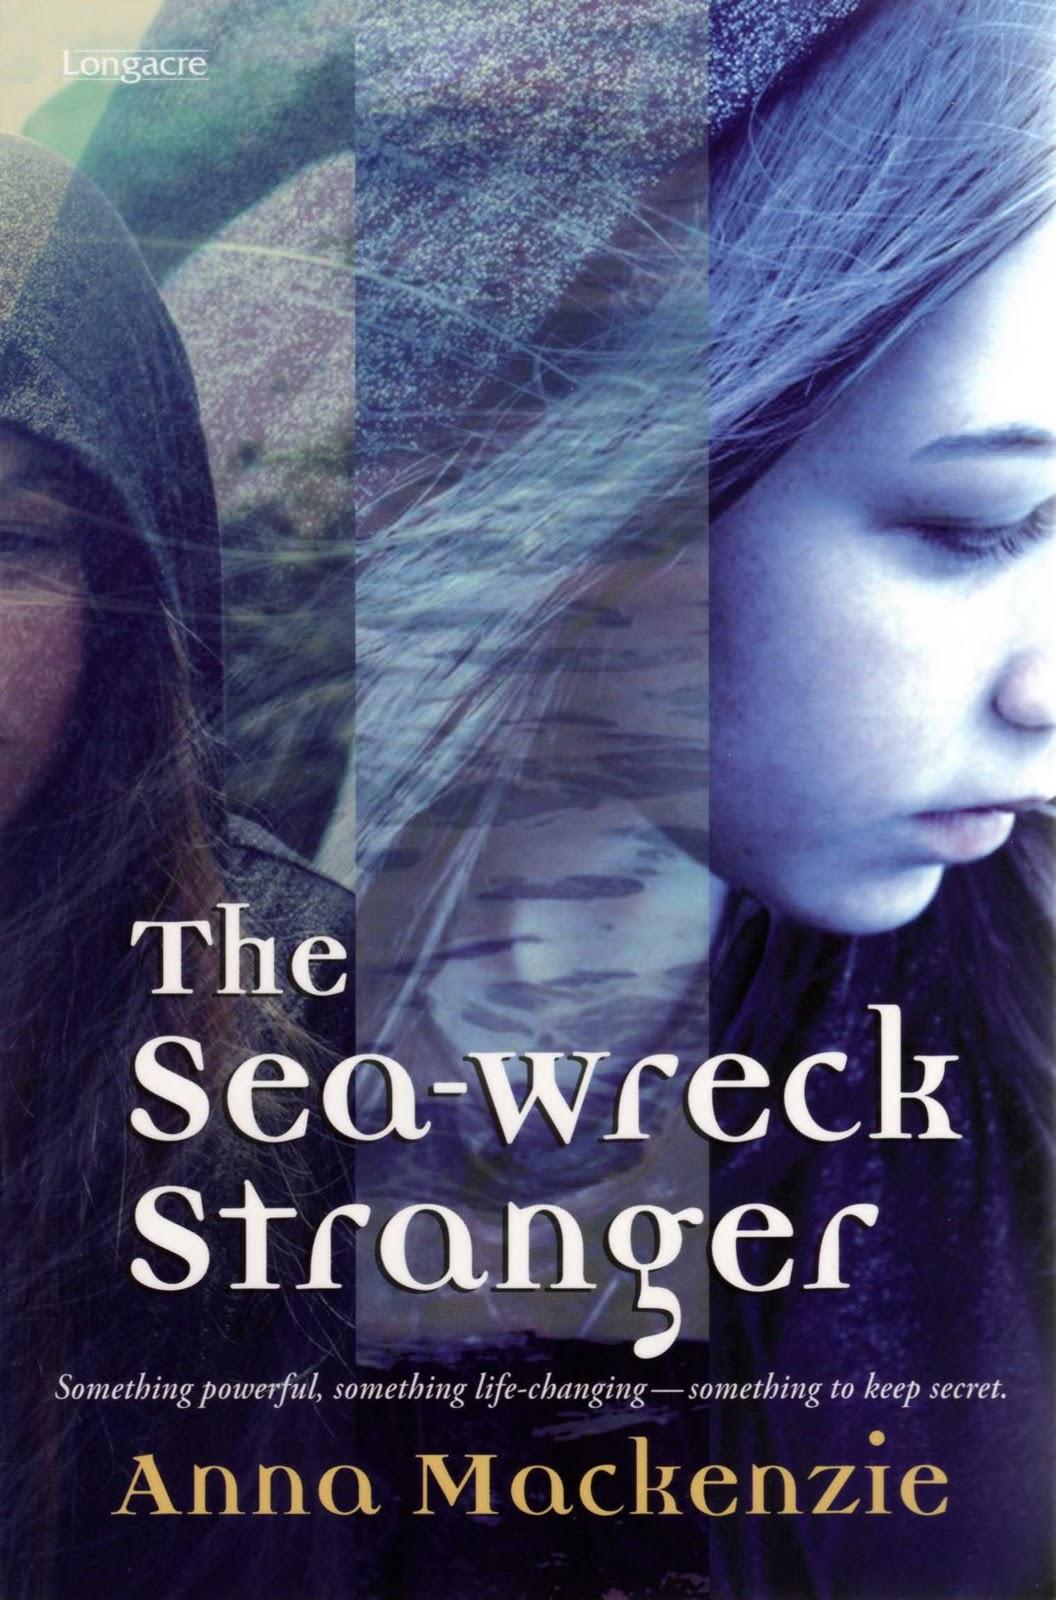 The Sea-Wrecked Stranger